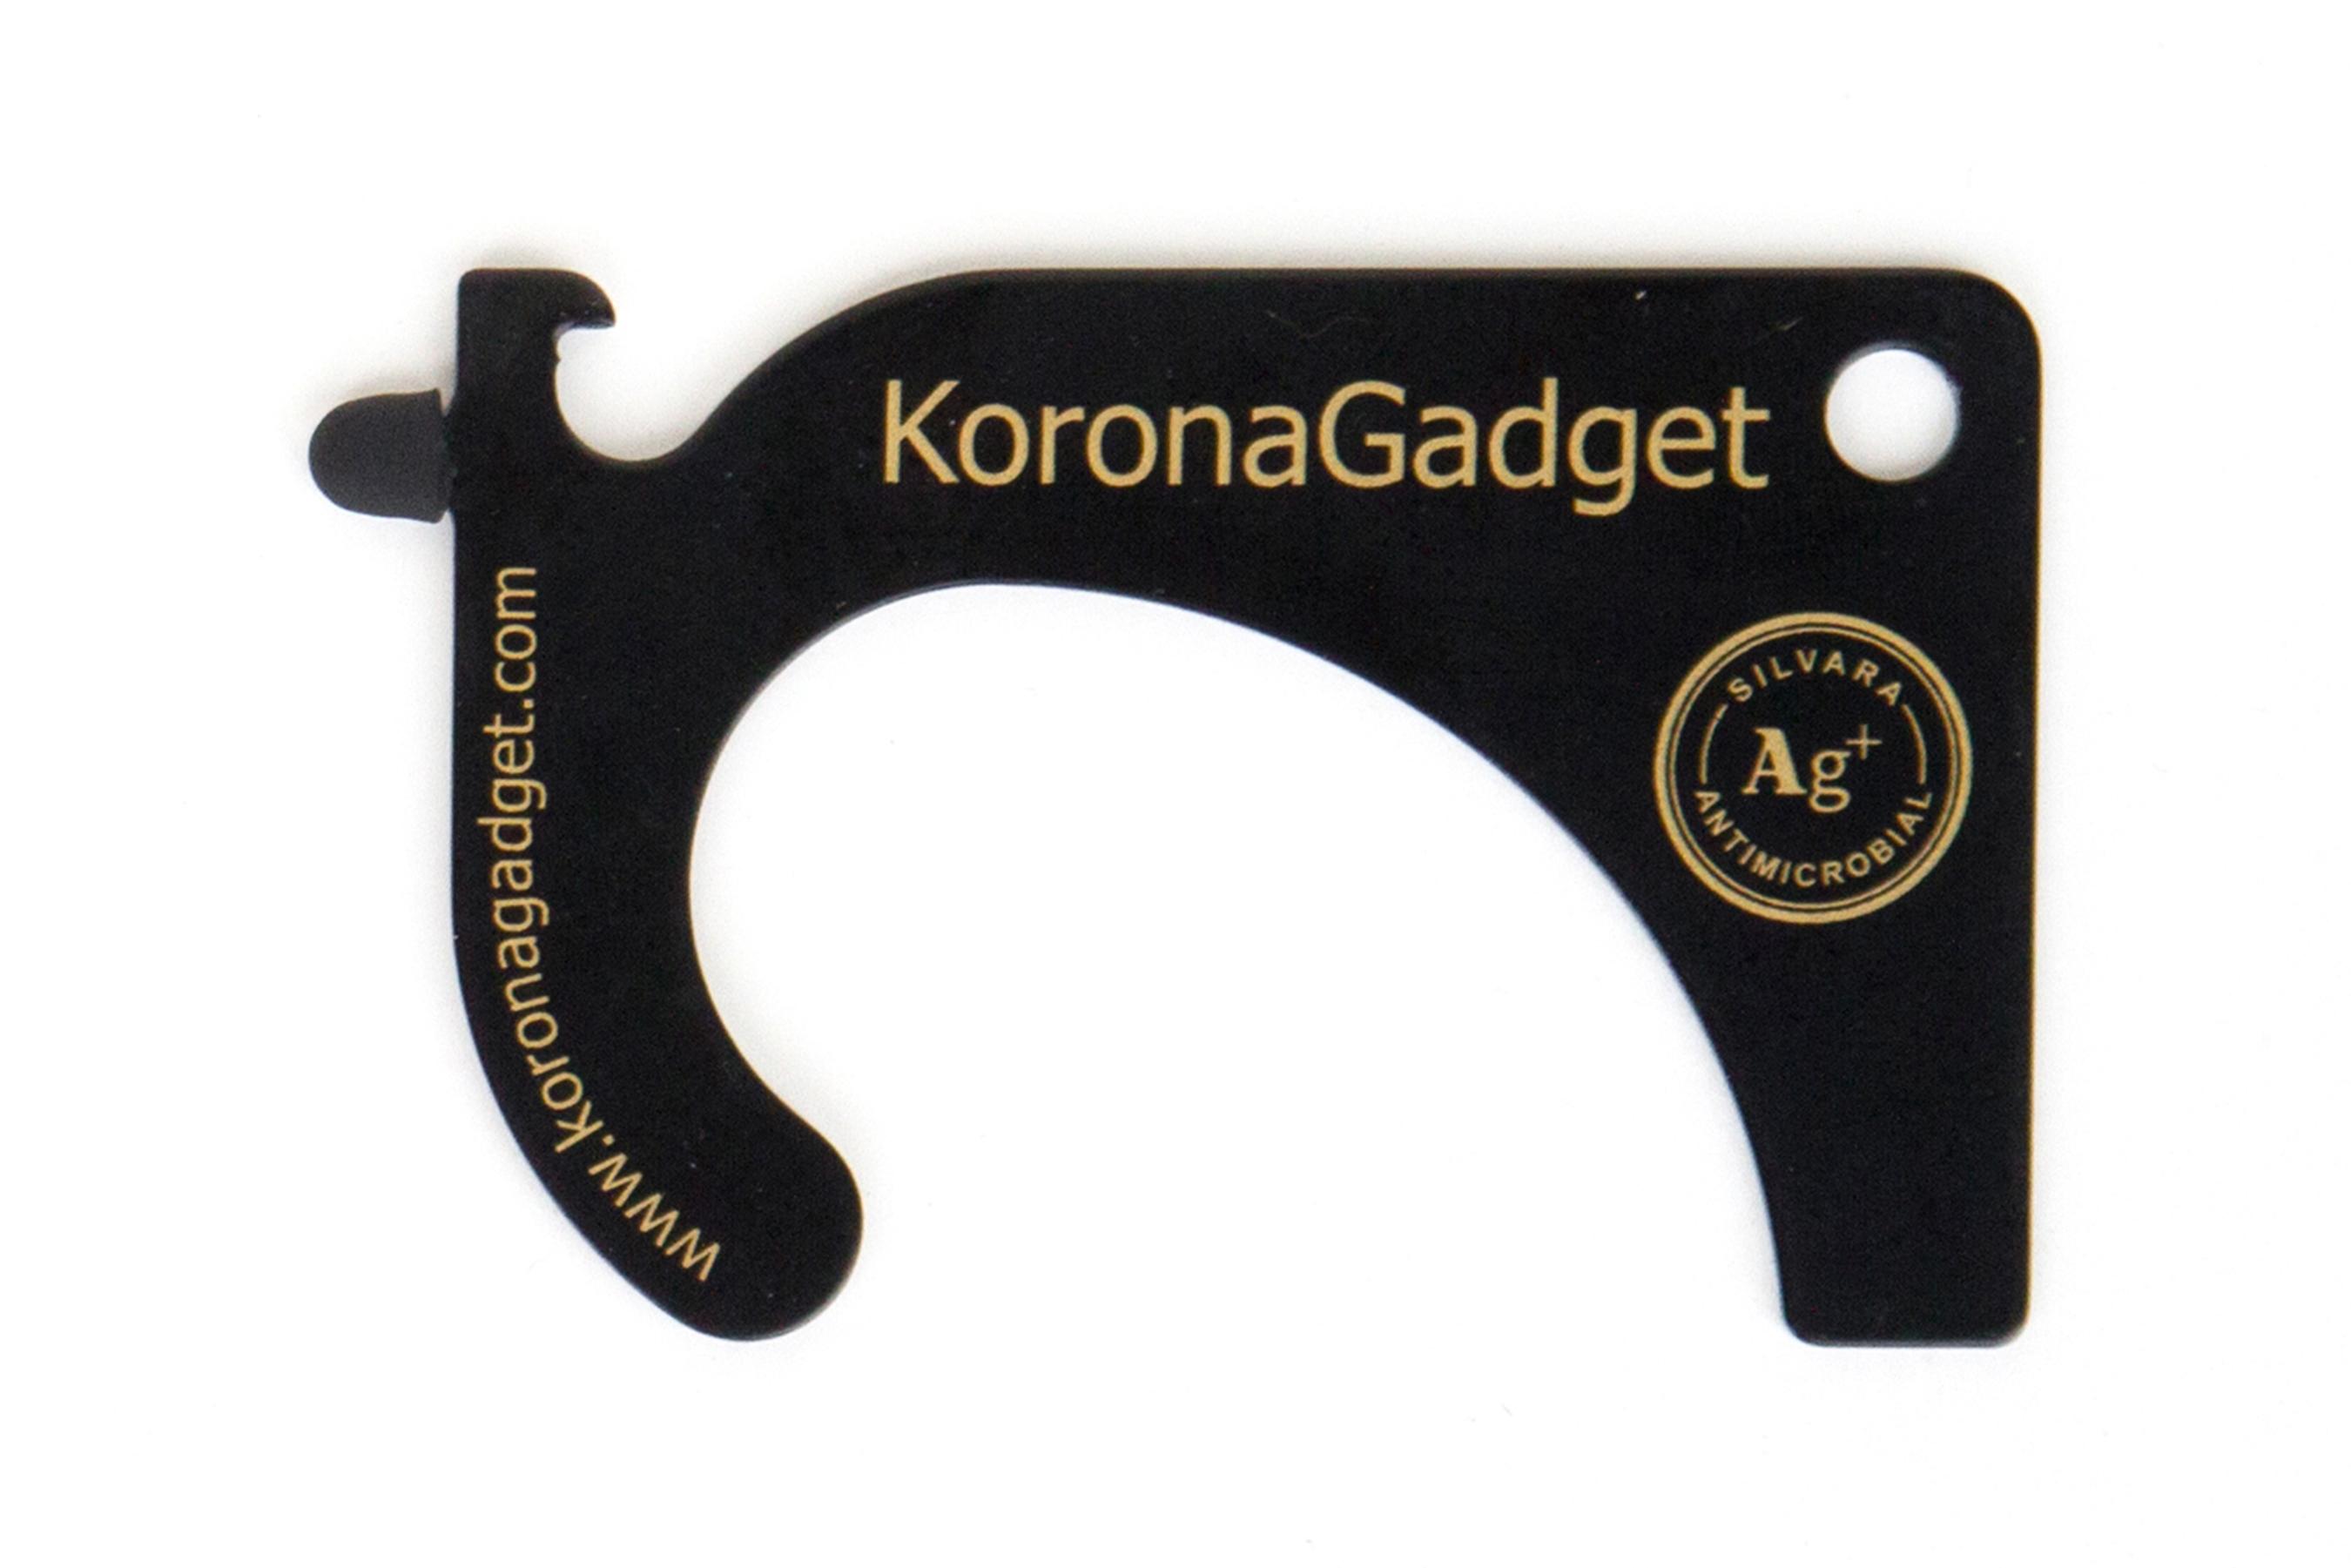 KoronaGadget by Sweetnam & Bradley